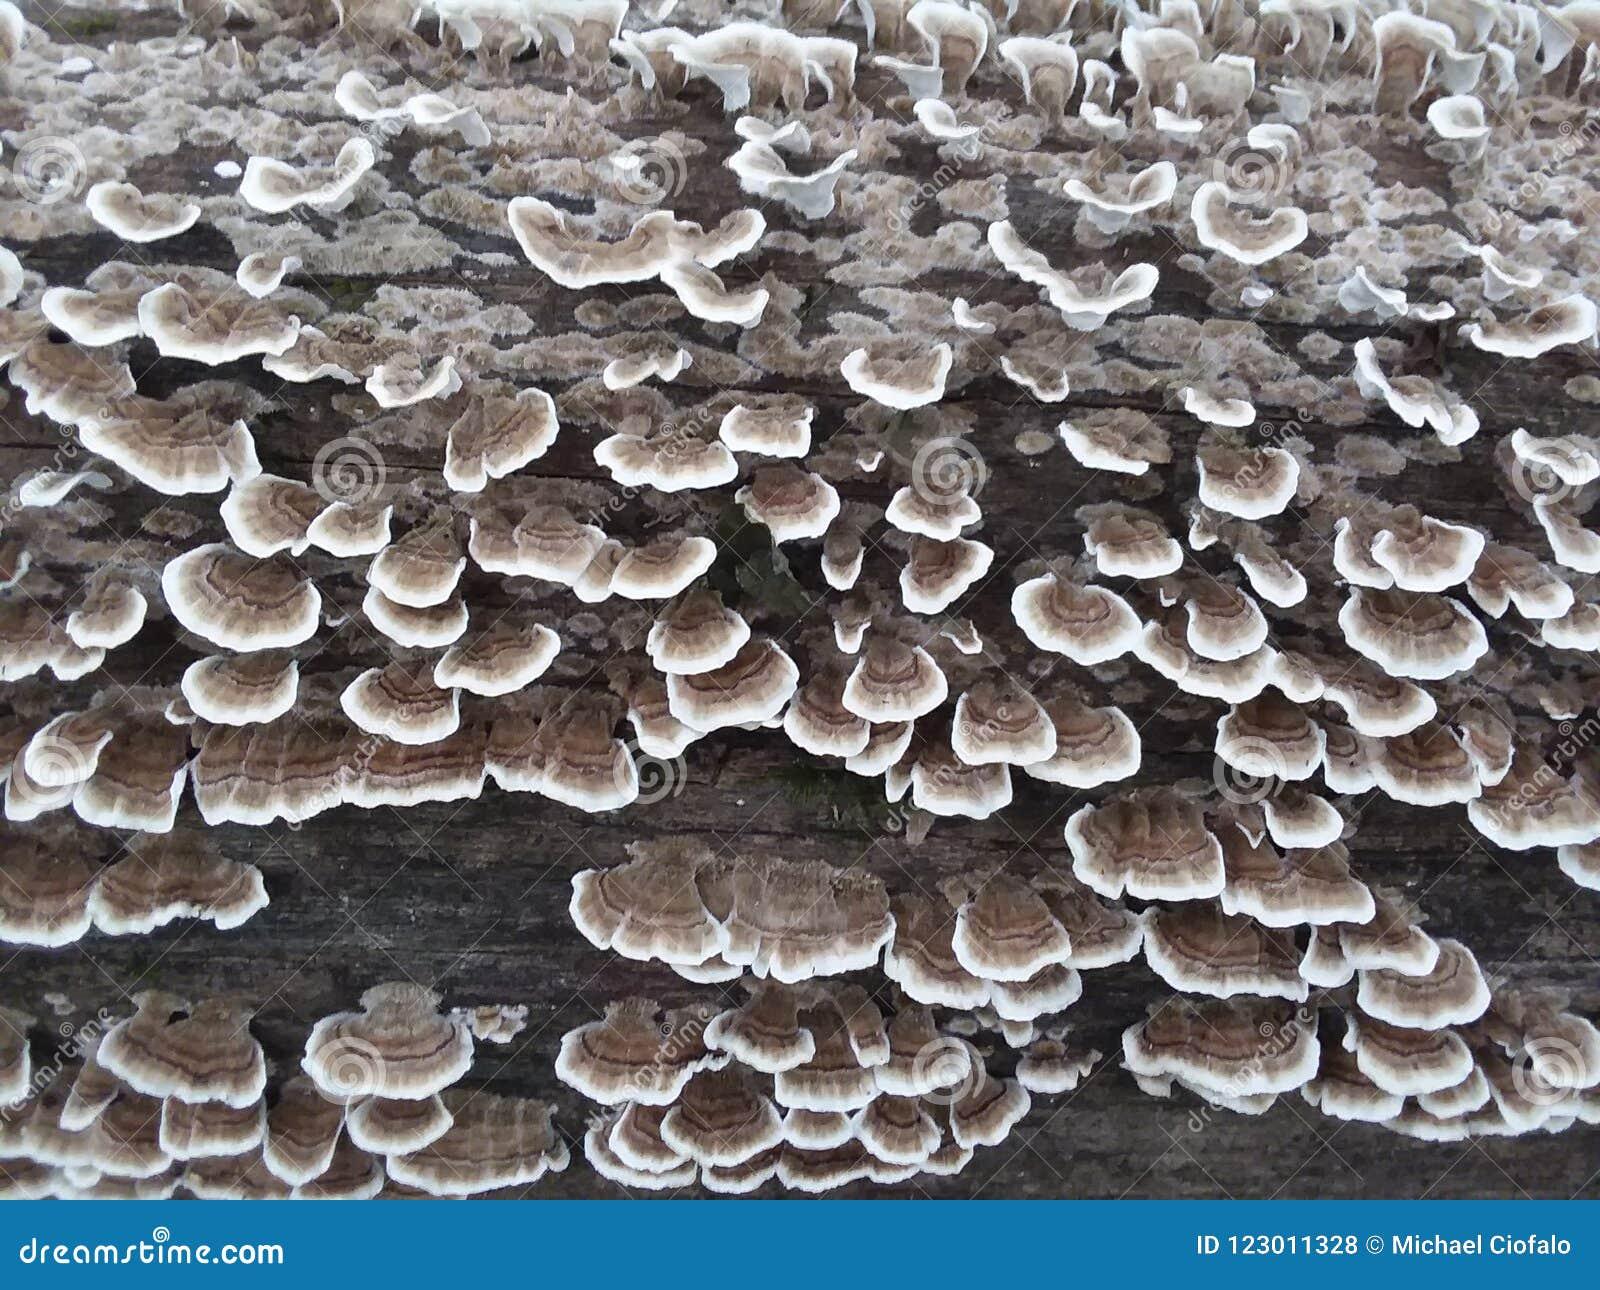 Flourishing fungus